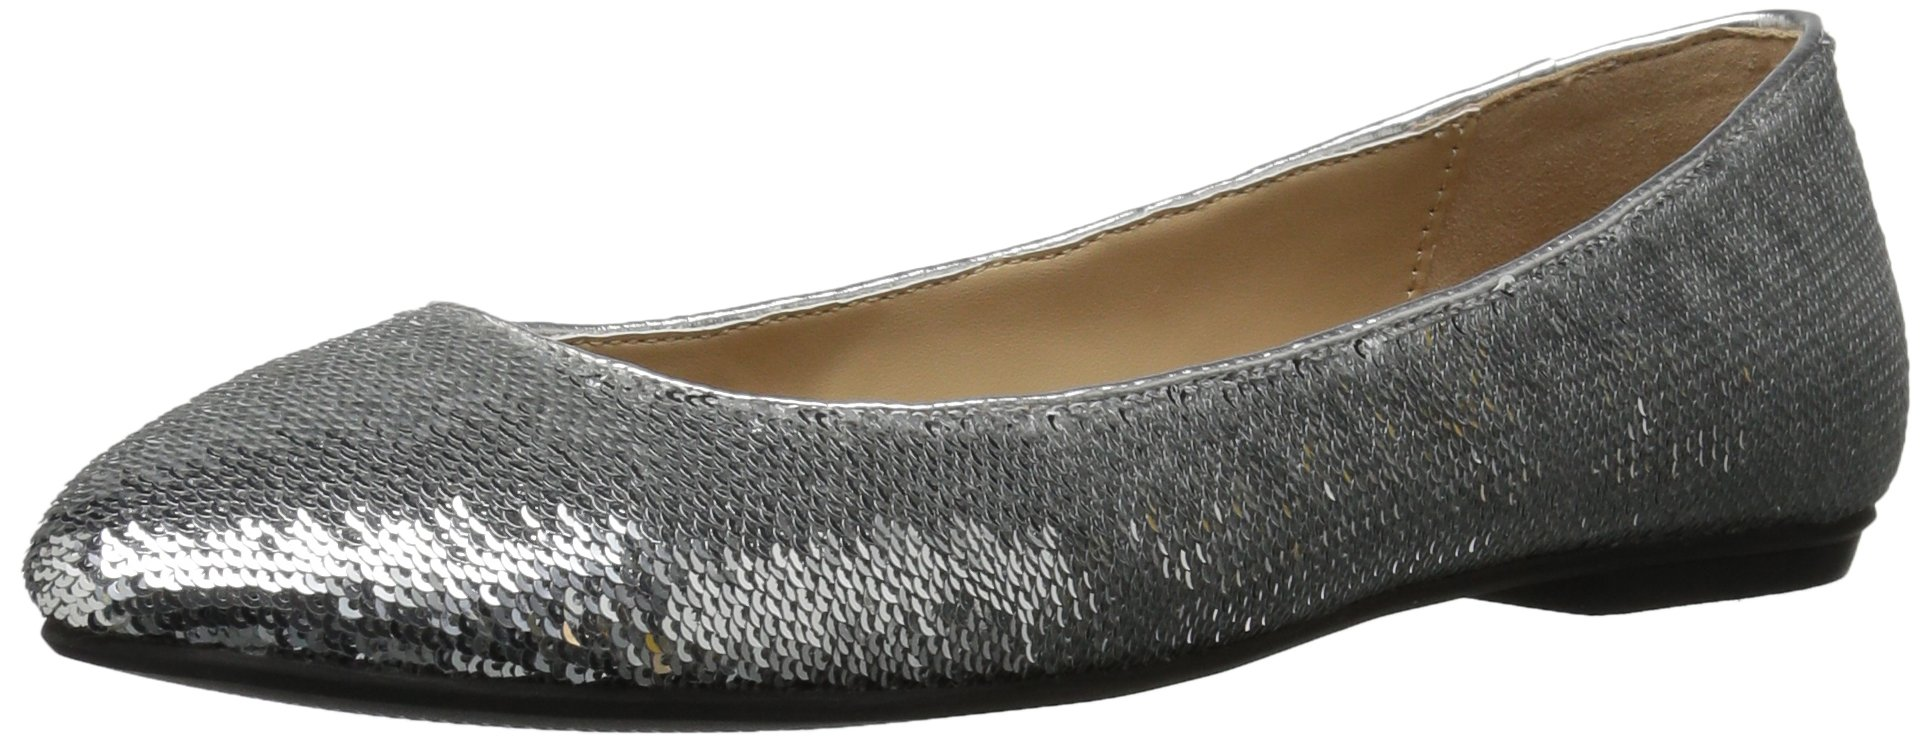 The Fix Women's Erica Round-Toe Sequin Ballet Flat, Silver Sequin, 10 B US